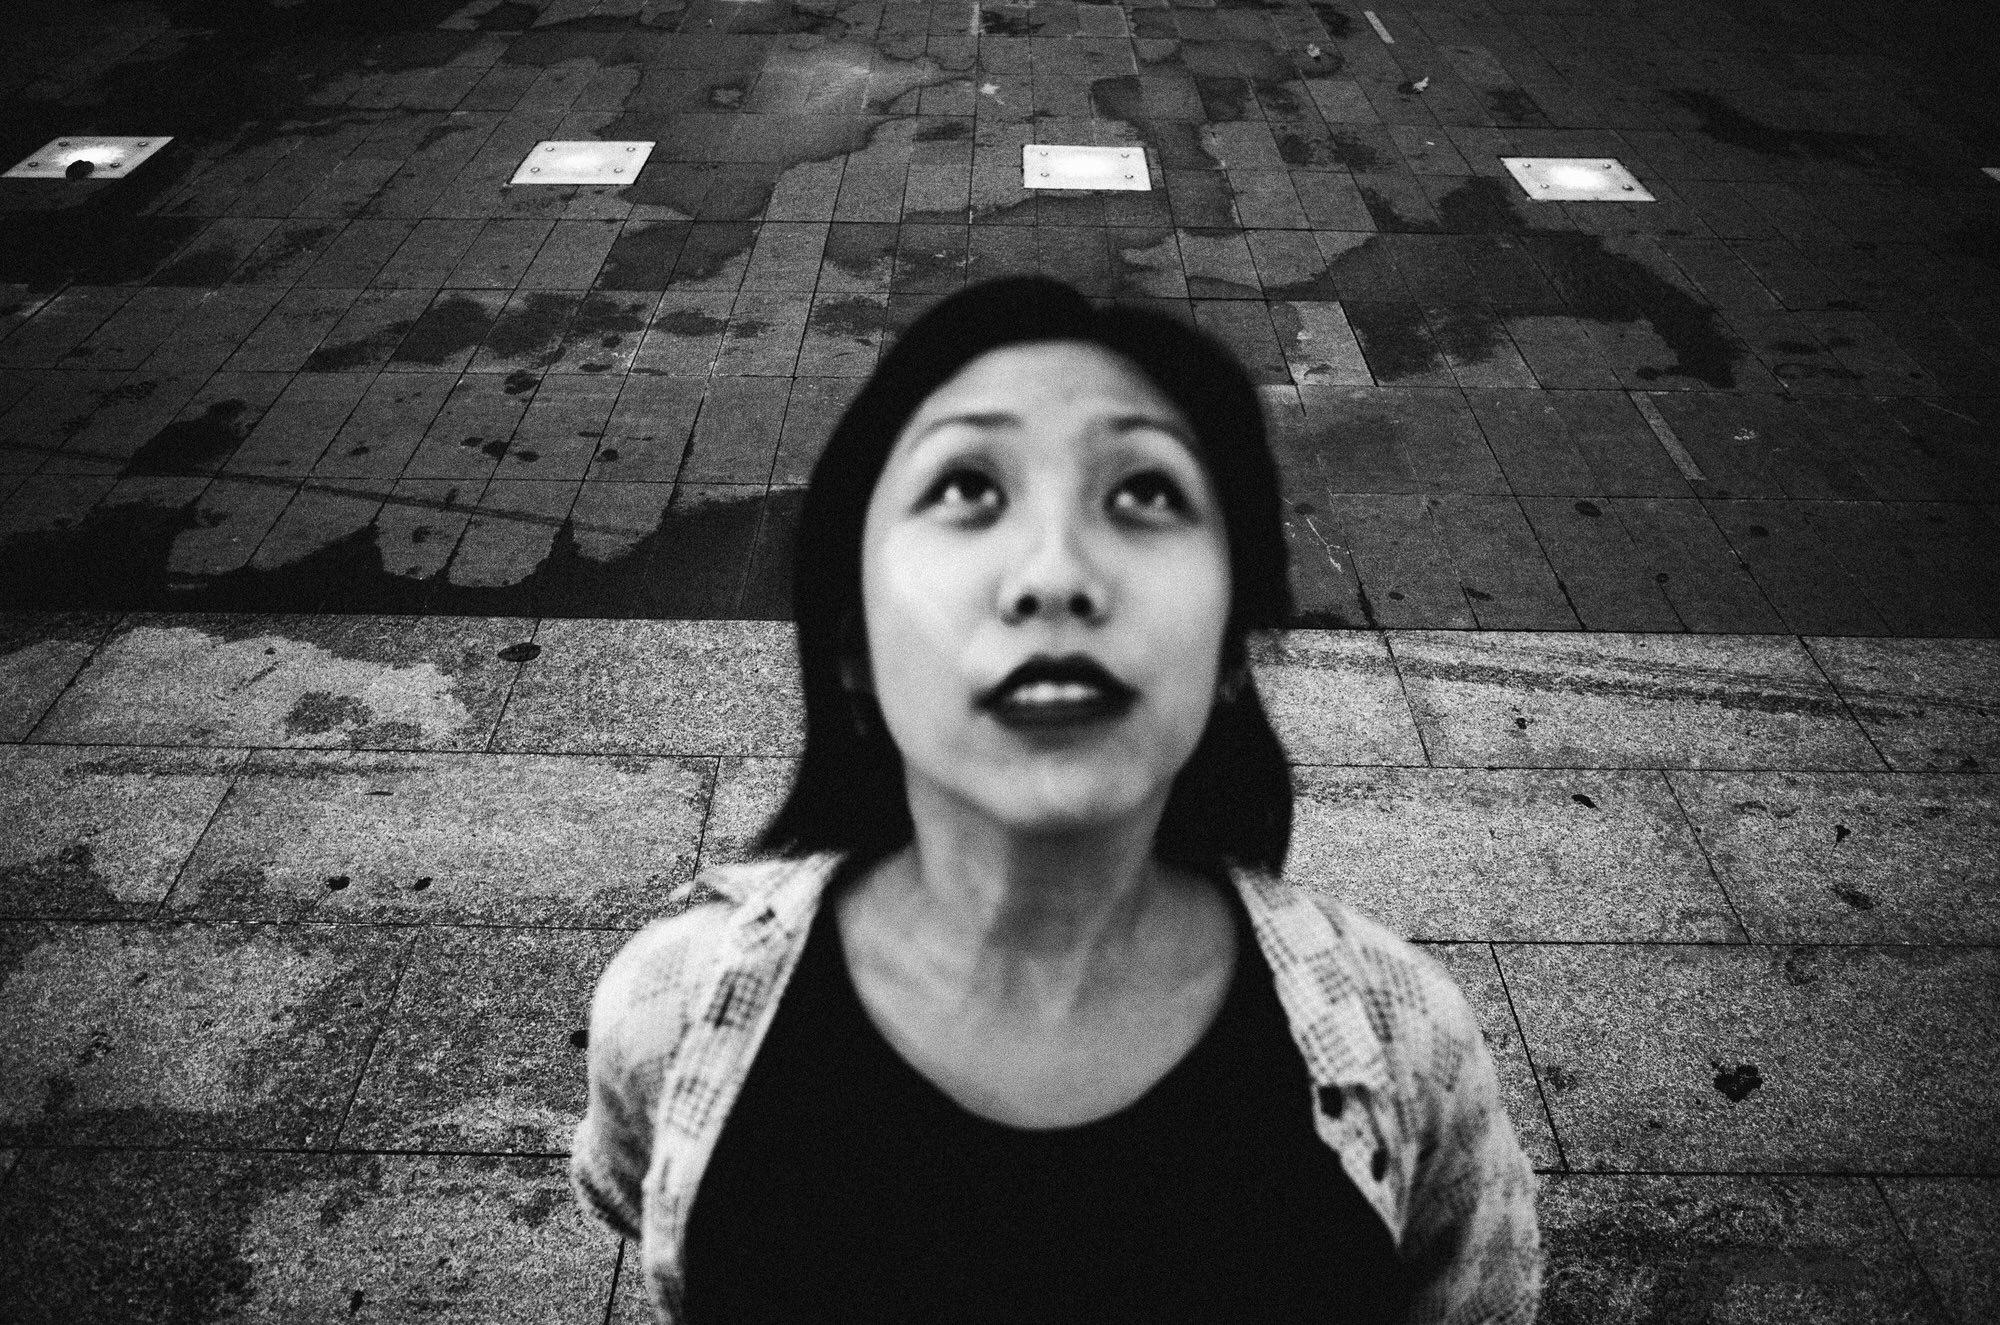 eric kim street photography black and white saigon 2017-0017193